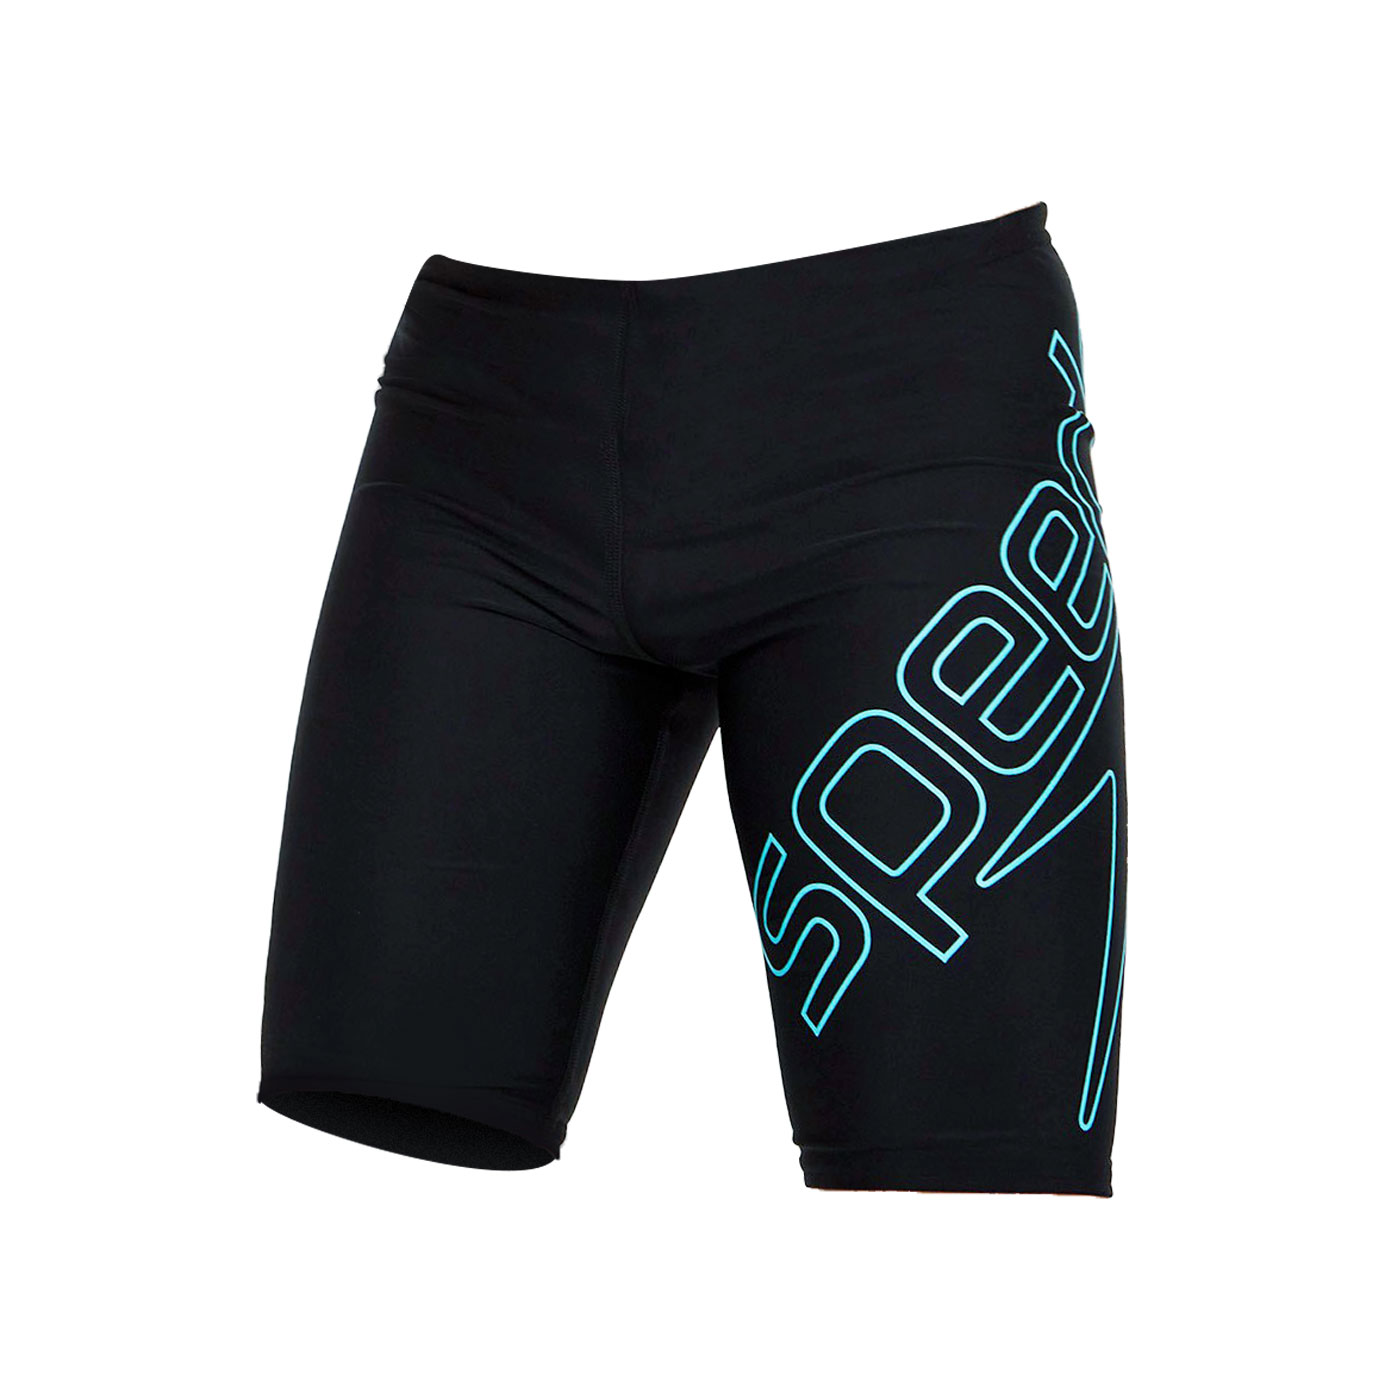 SPEEDO 男孩運動及膝泳褲 SD812407F888 - 黑水藍